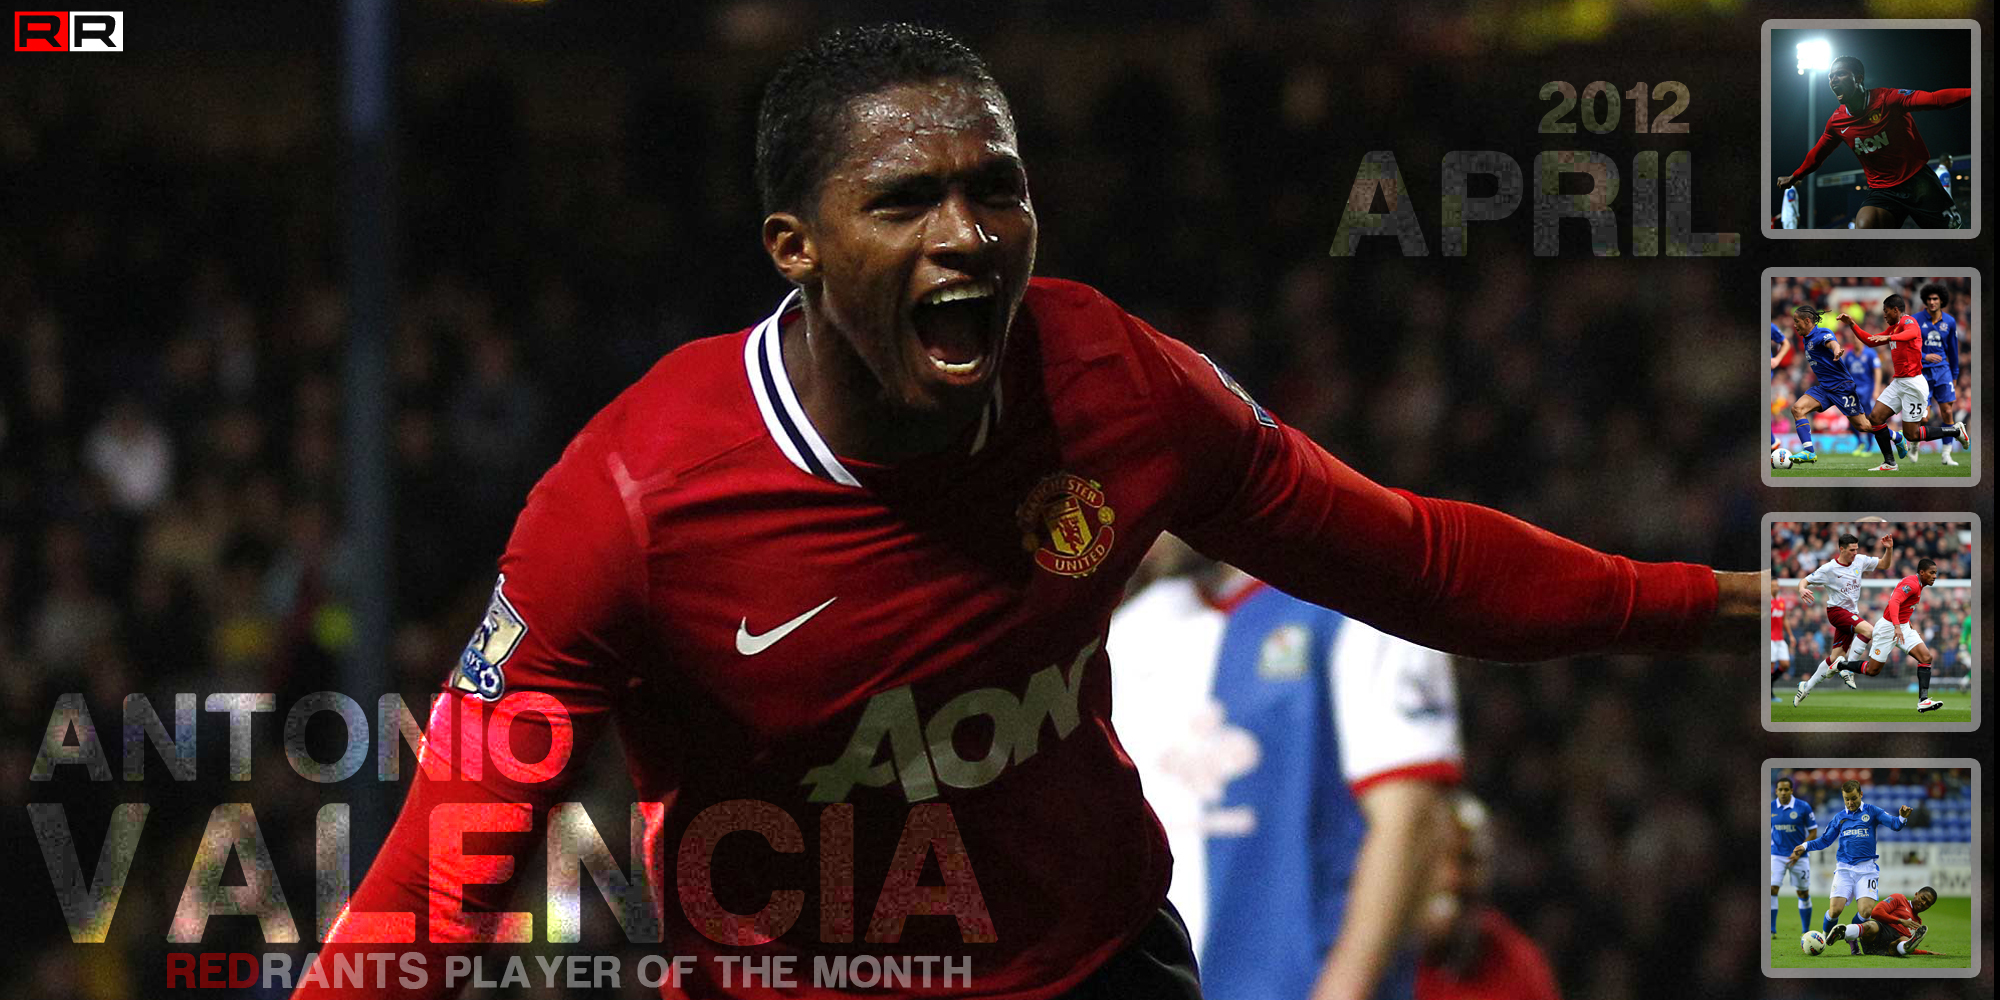 Player of the Month – April 2012 – Antonio Valencia